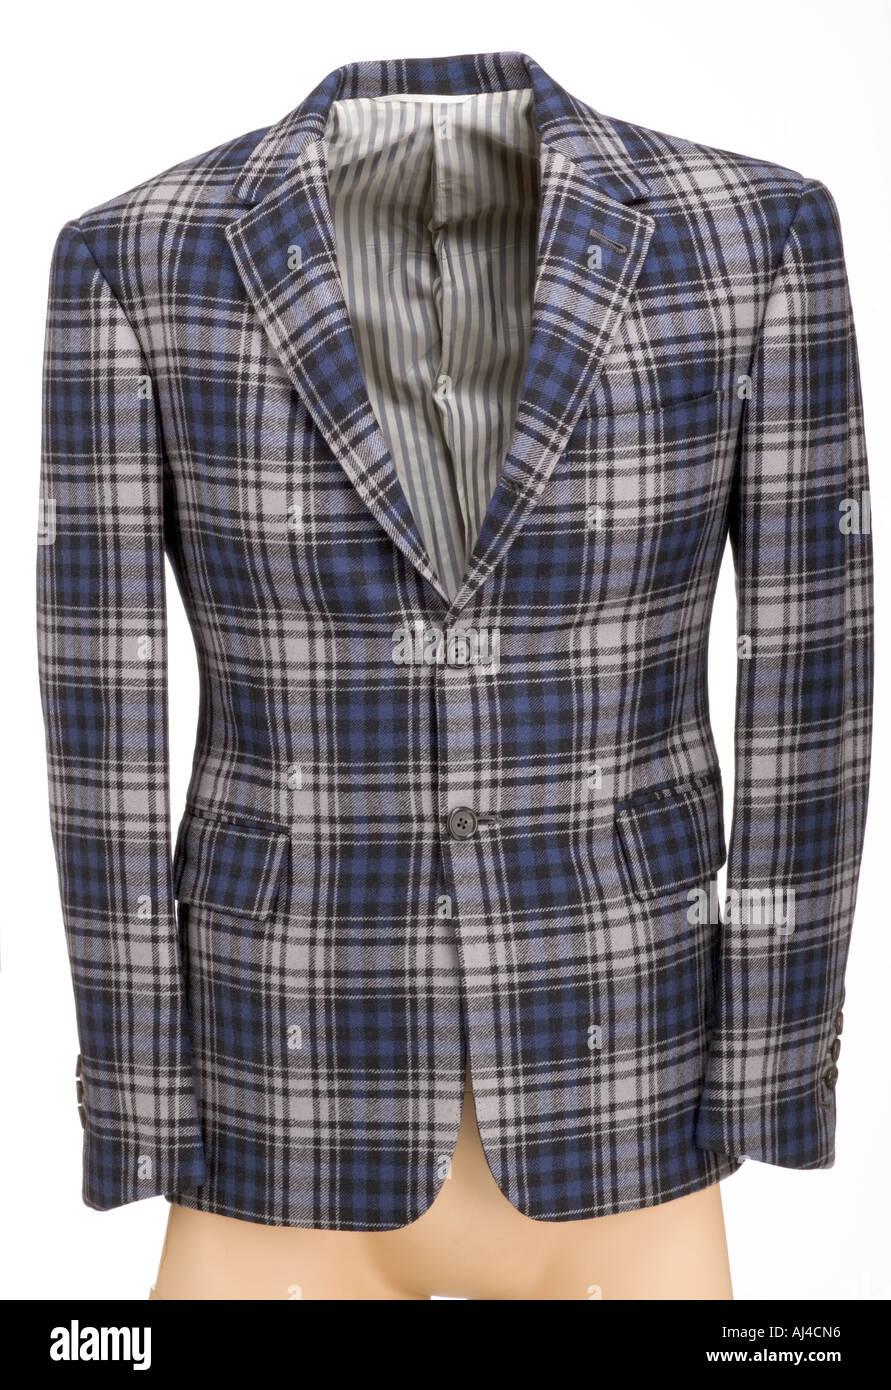 Man's check pattern jacket - Stock Image